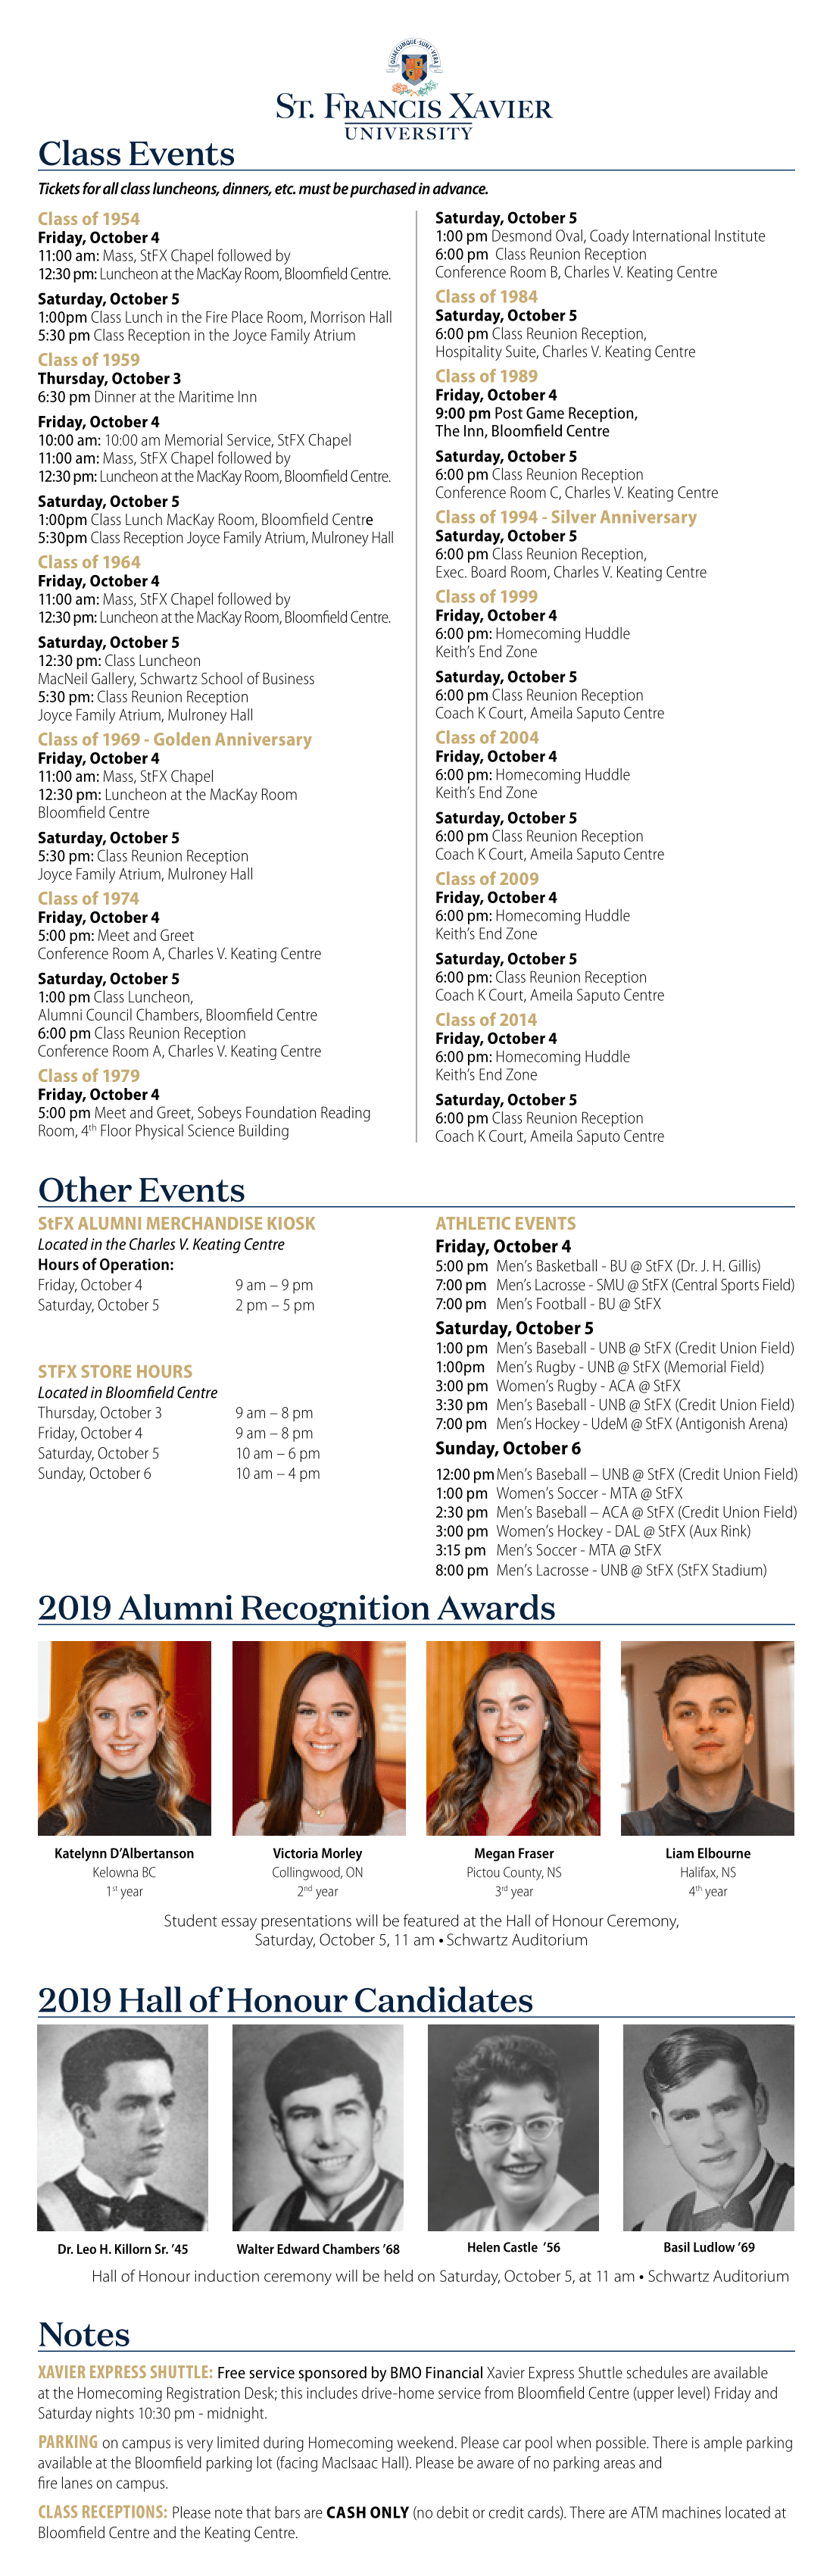 2019 Homecoming Schedule